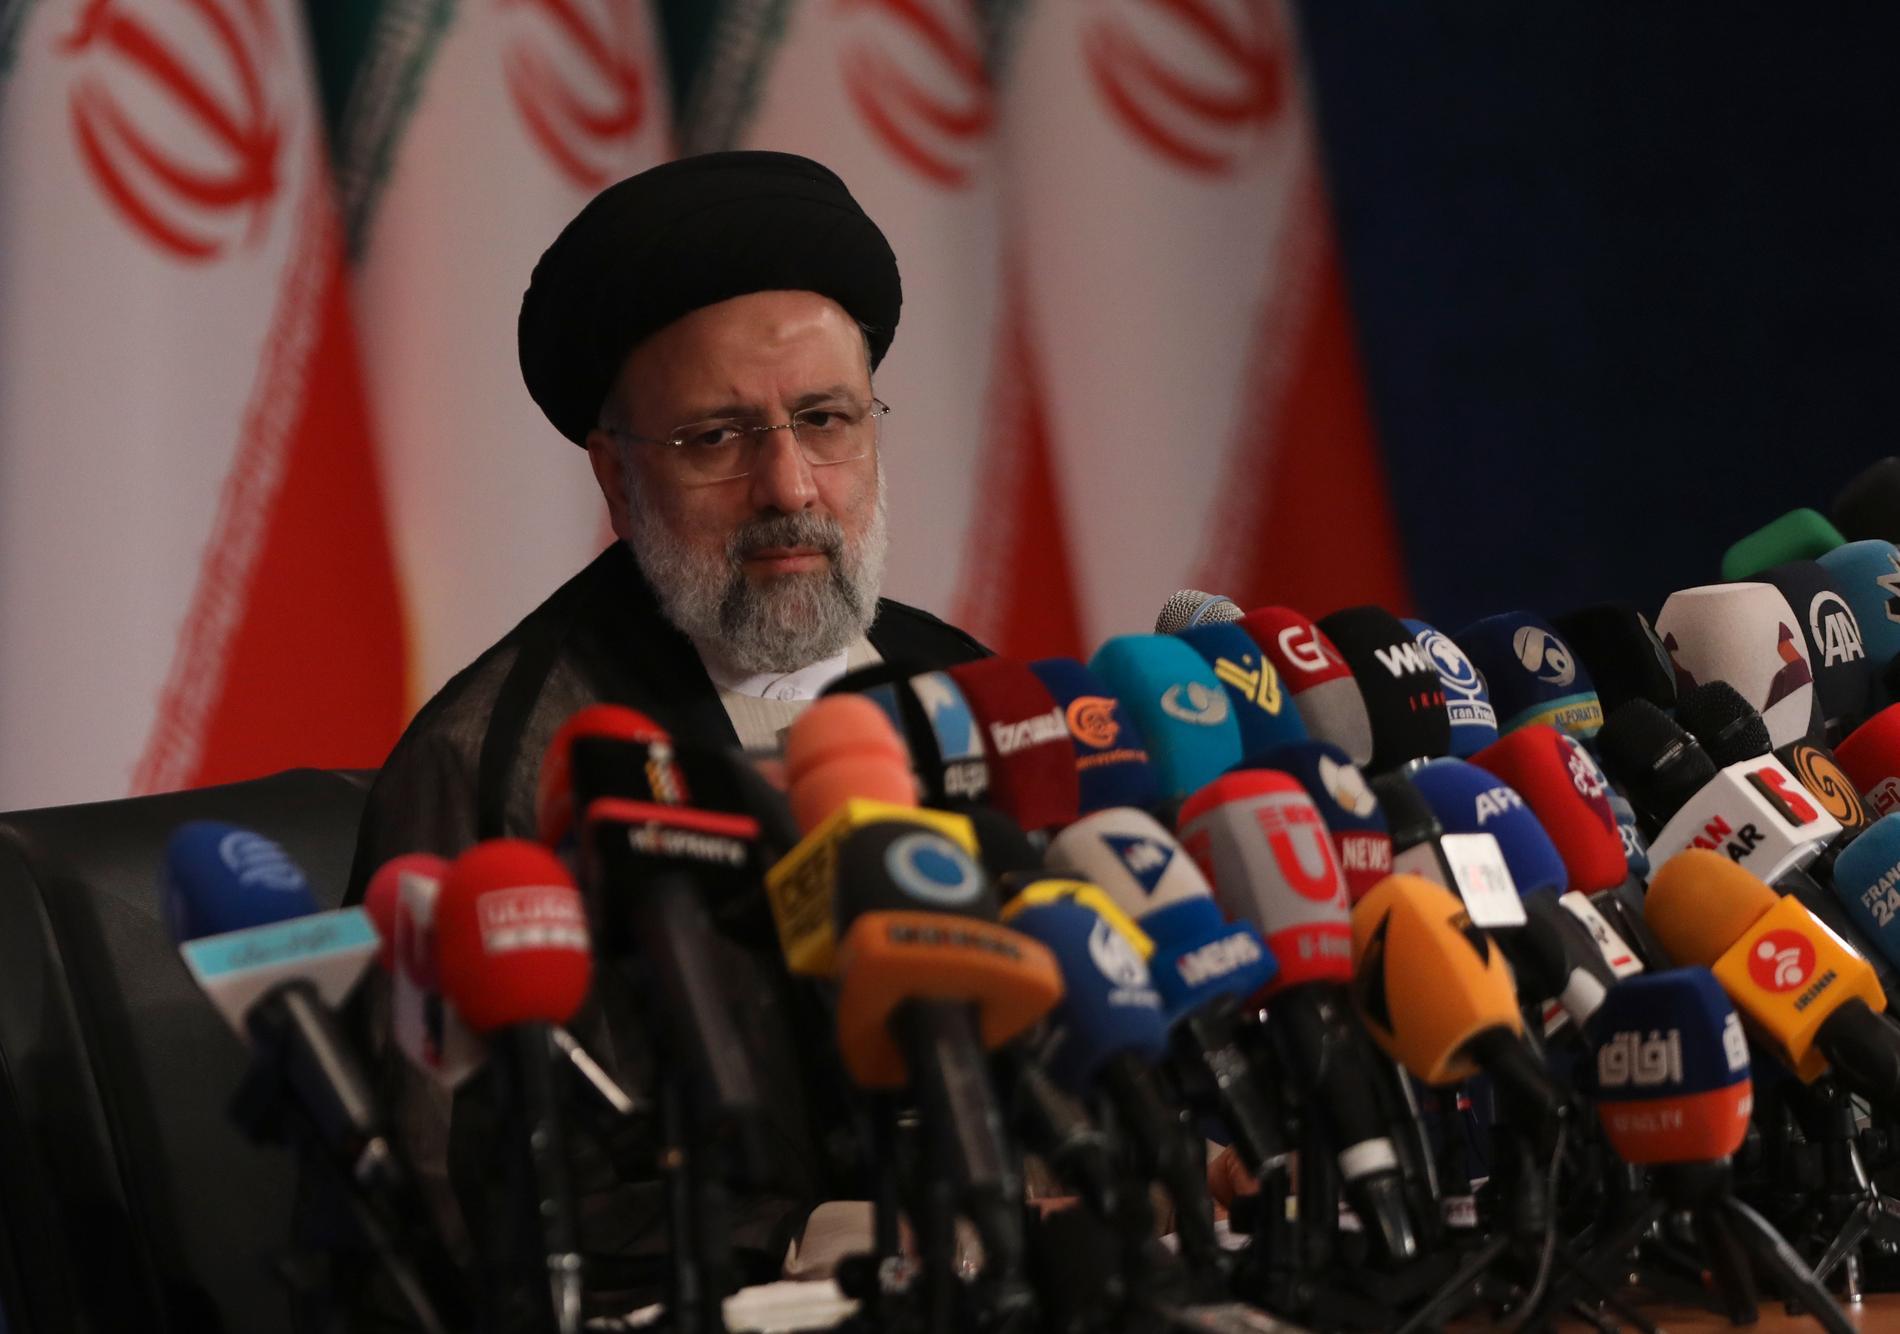 Tillträdande presidenten Ebrahim Raisi pekas ut som en av totalt fyra domare som suttit i den så kallade dödskommittén.